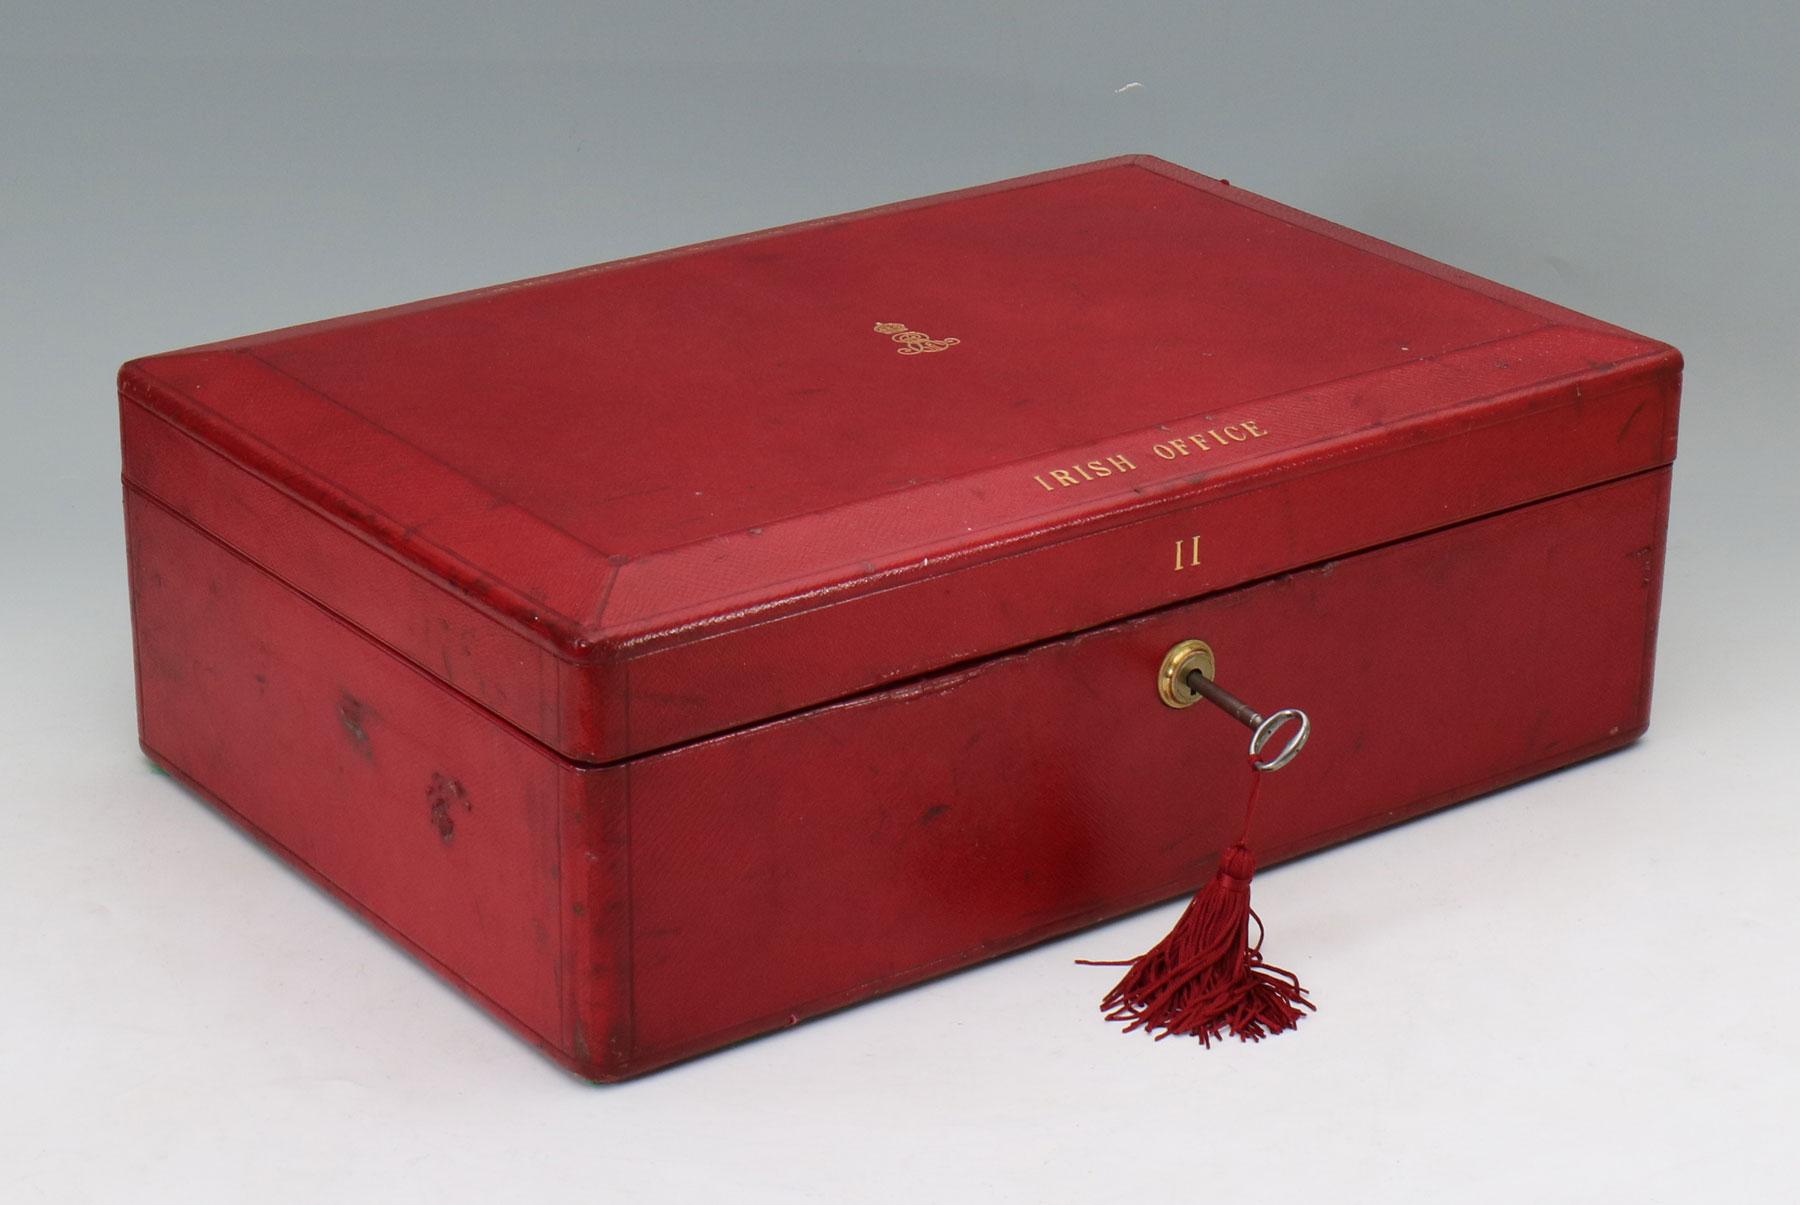 9499 An Edwardian Wickwar Red Leather Bound Parliamentary